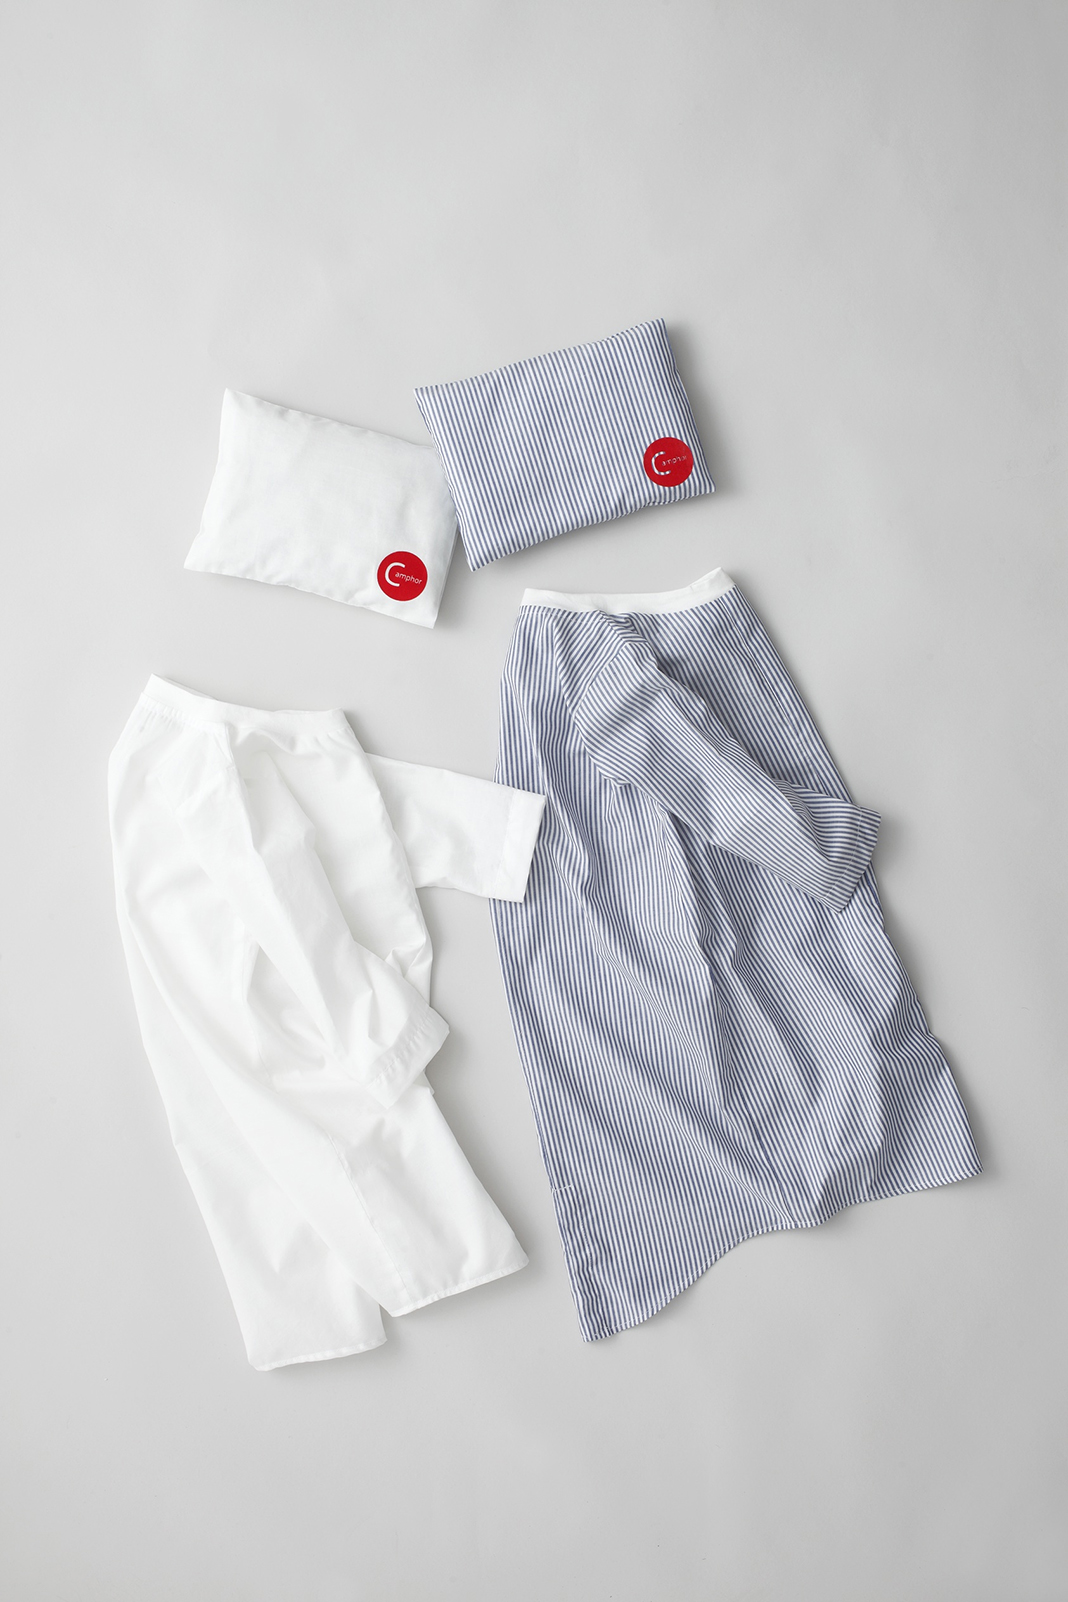 Camphor カンフル kids こども 子供服 everydaypajamas pajamas パジャマ